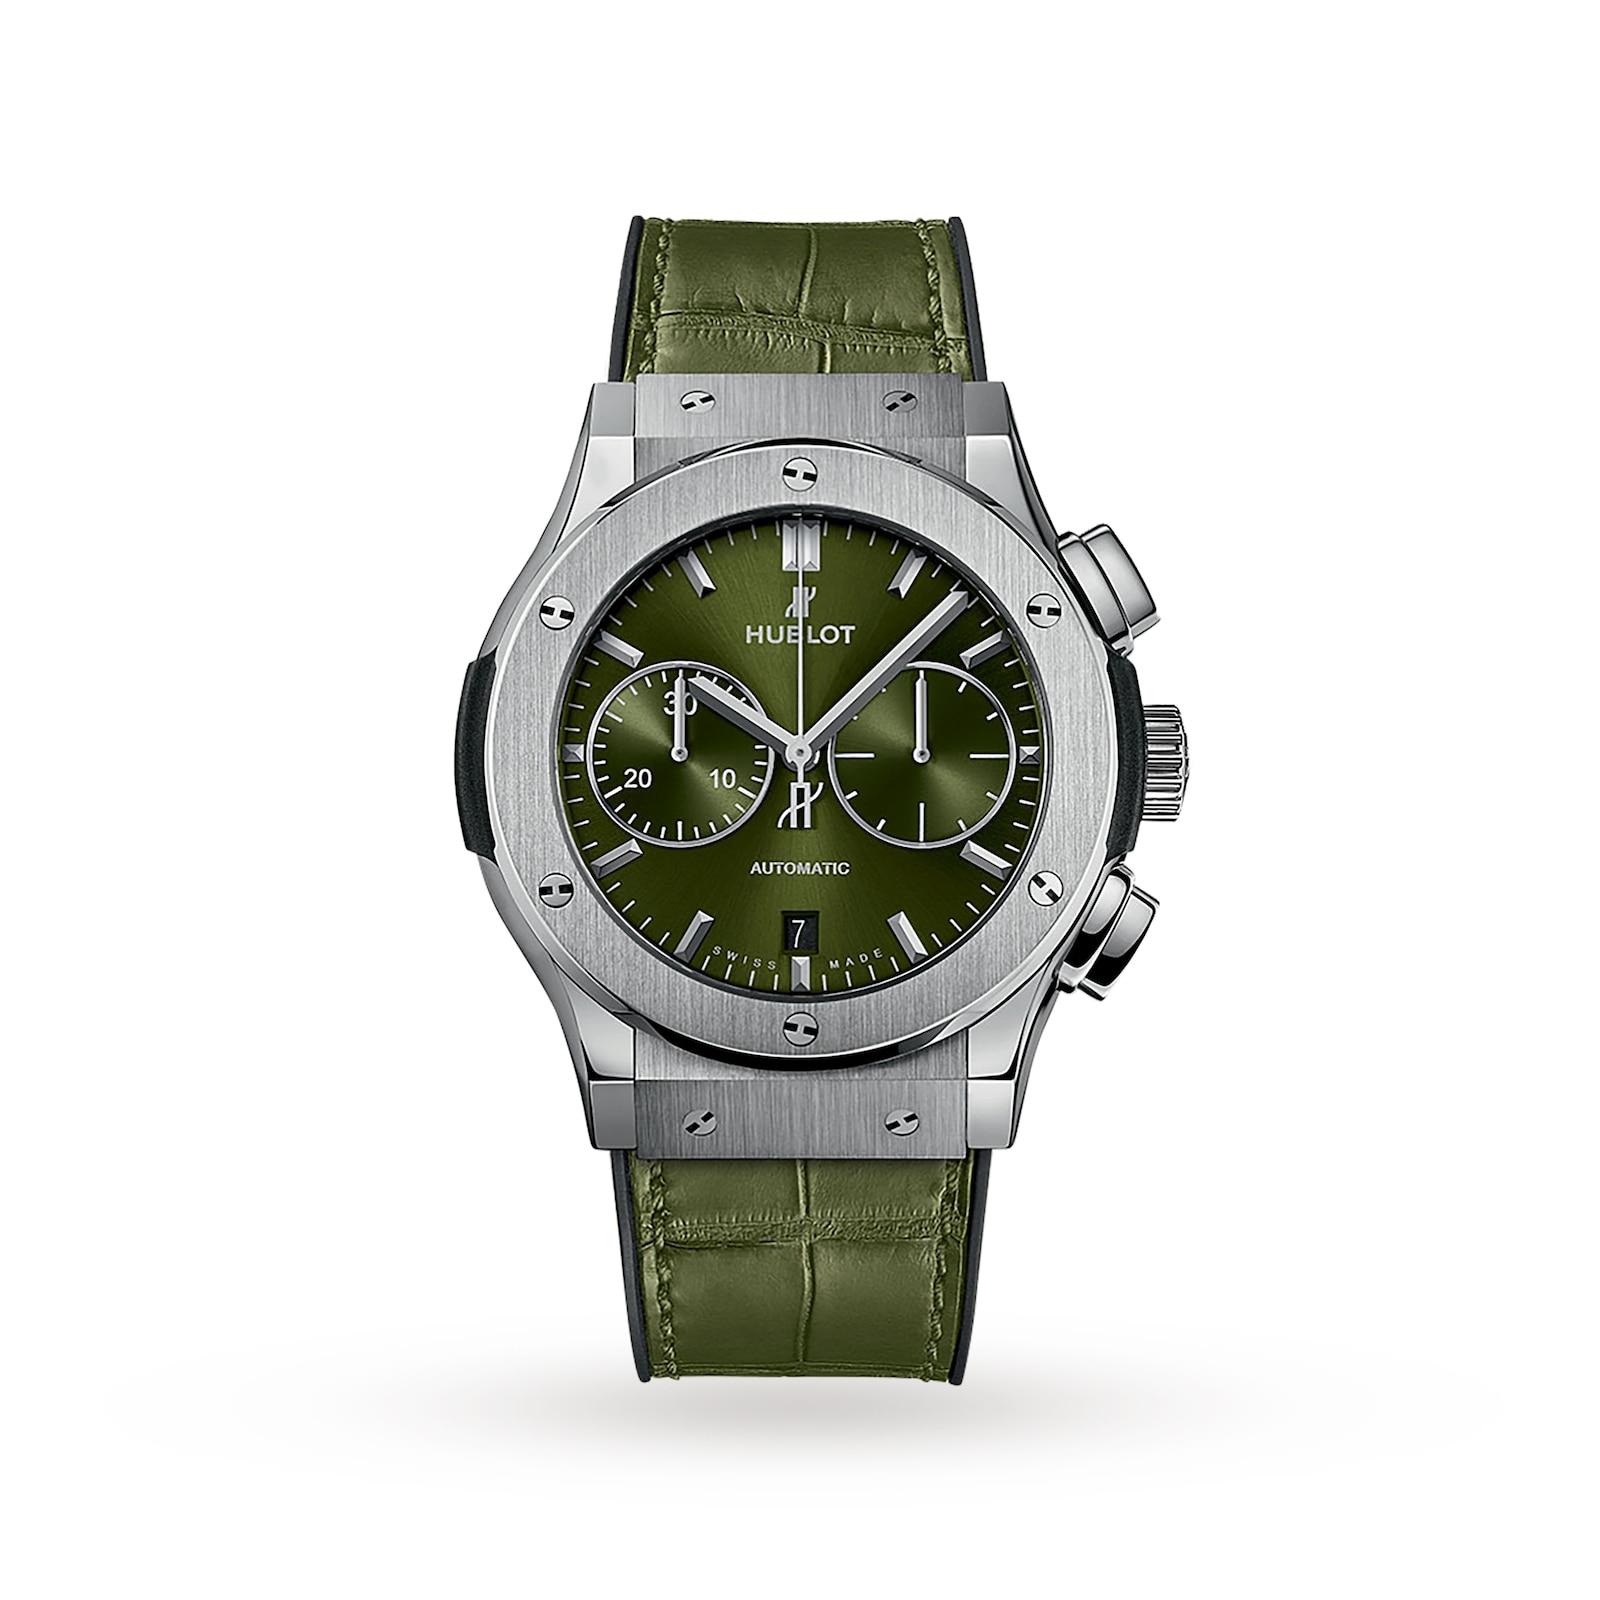 Hublot Hublot Classic Fusion Chronograph Titanium Green 45mm